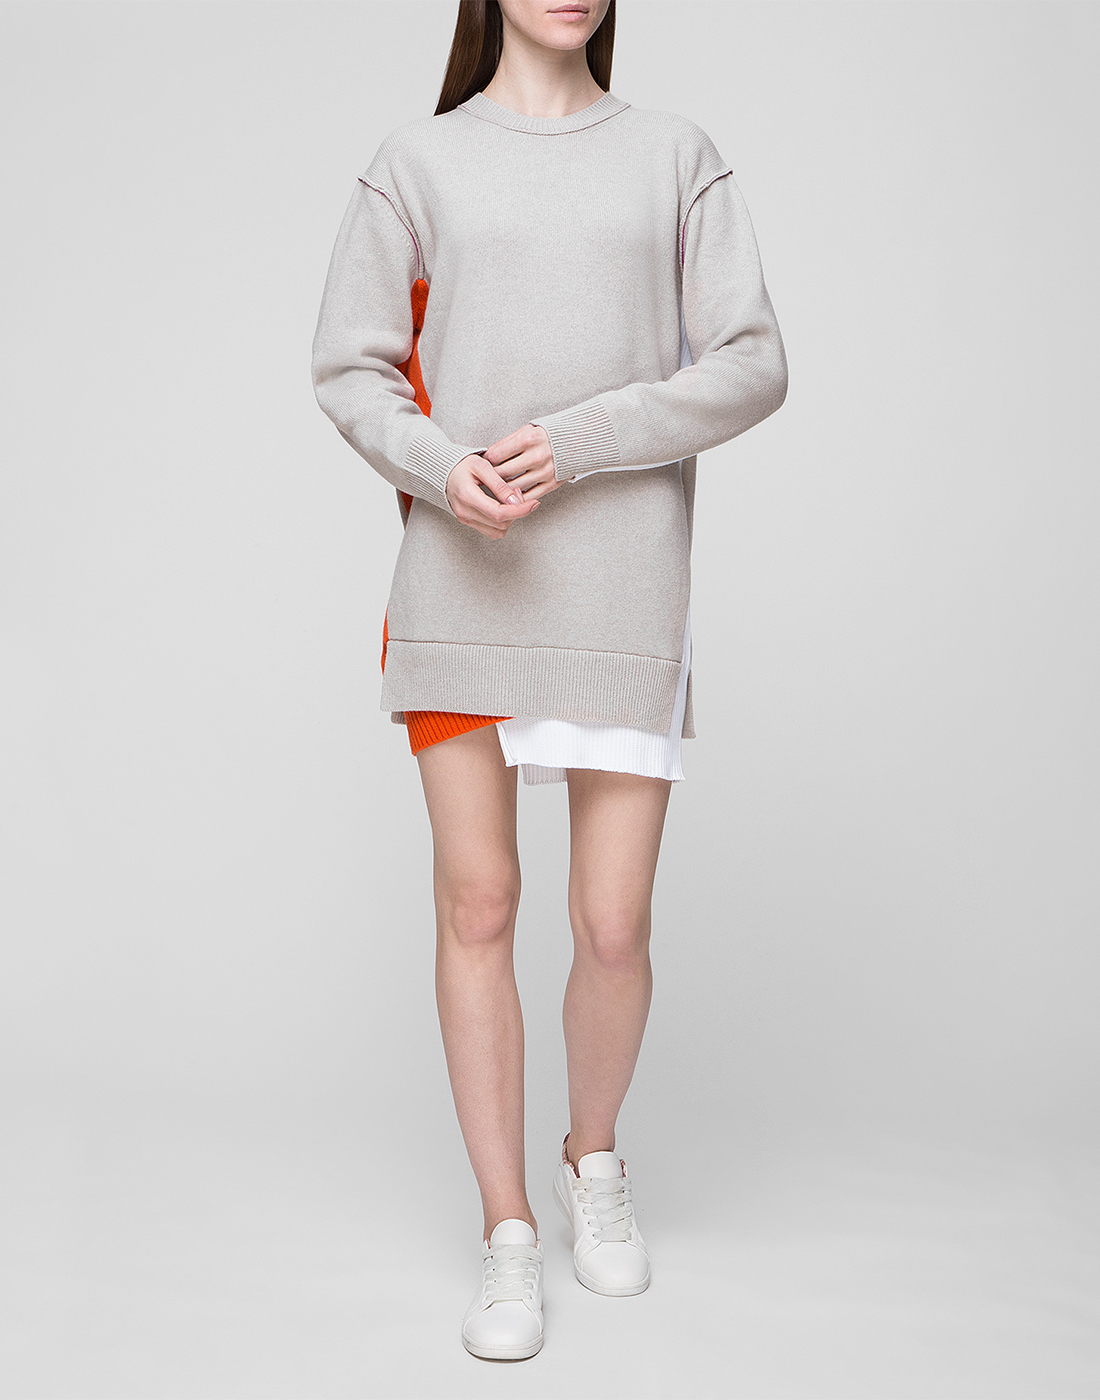 Женское бежевое шерстяное платье Dorothee Schumacher S516304/031-5